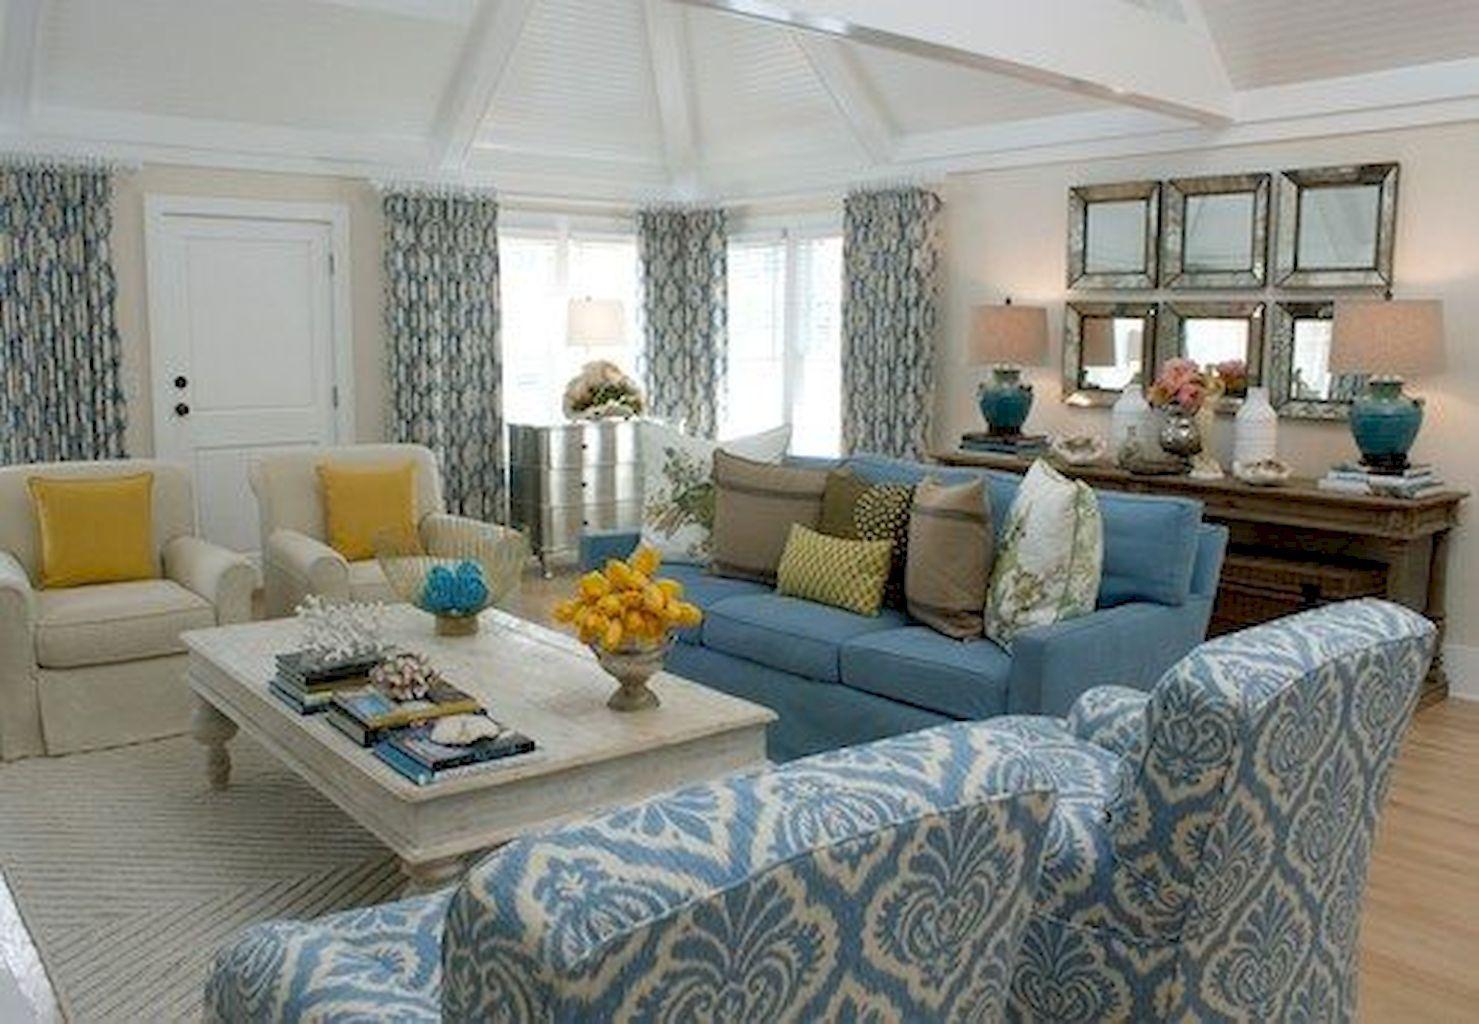 Nice 80 elegant harmony interior design ideas for first couple https livingmarch